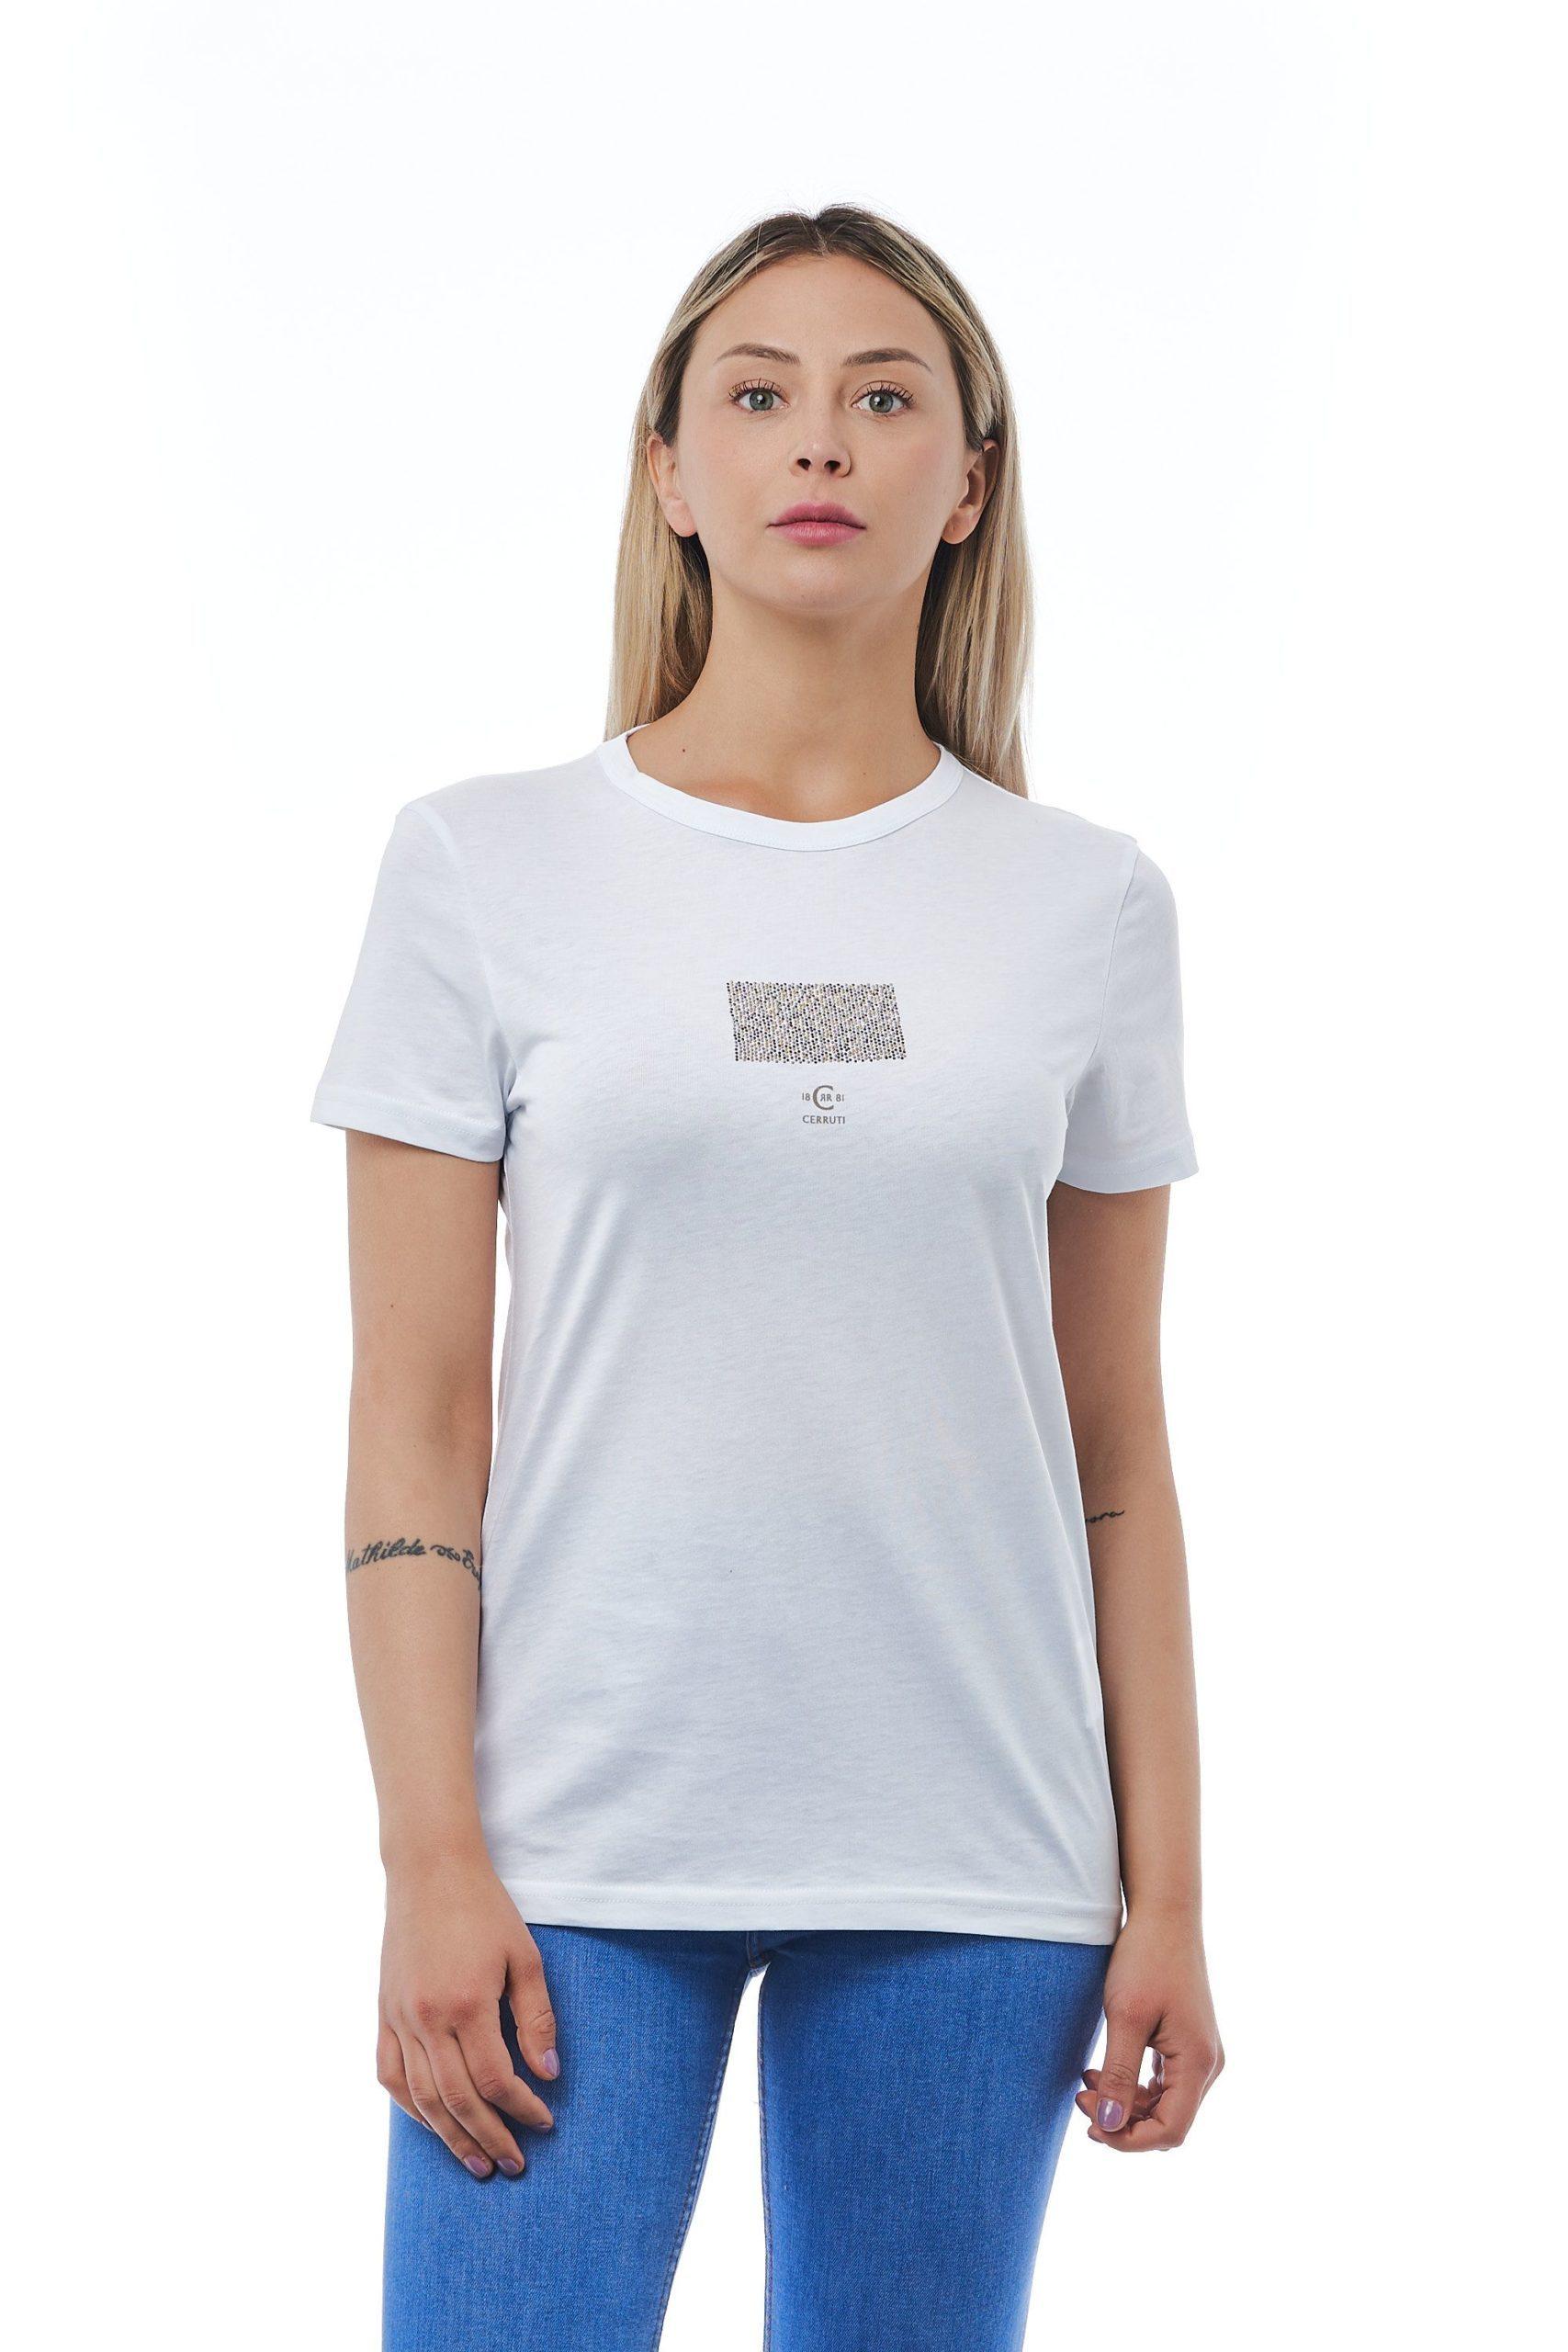 Cerruti 1881 Women's Bianco T-Shirt White CE1410156 - M